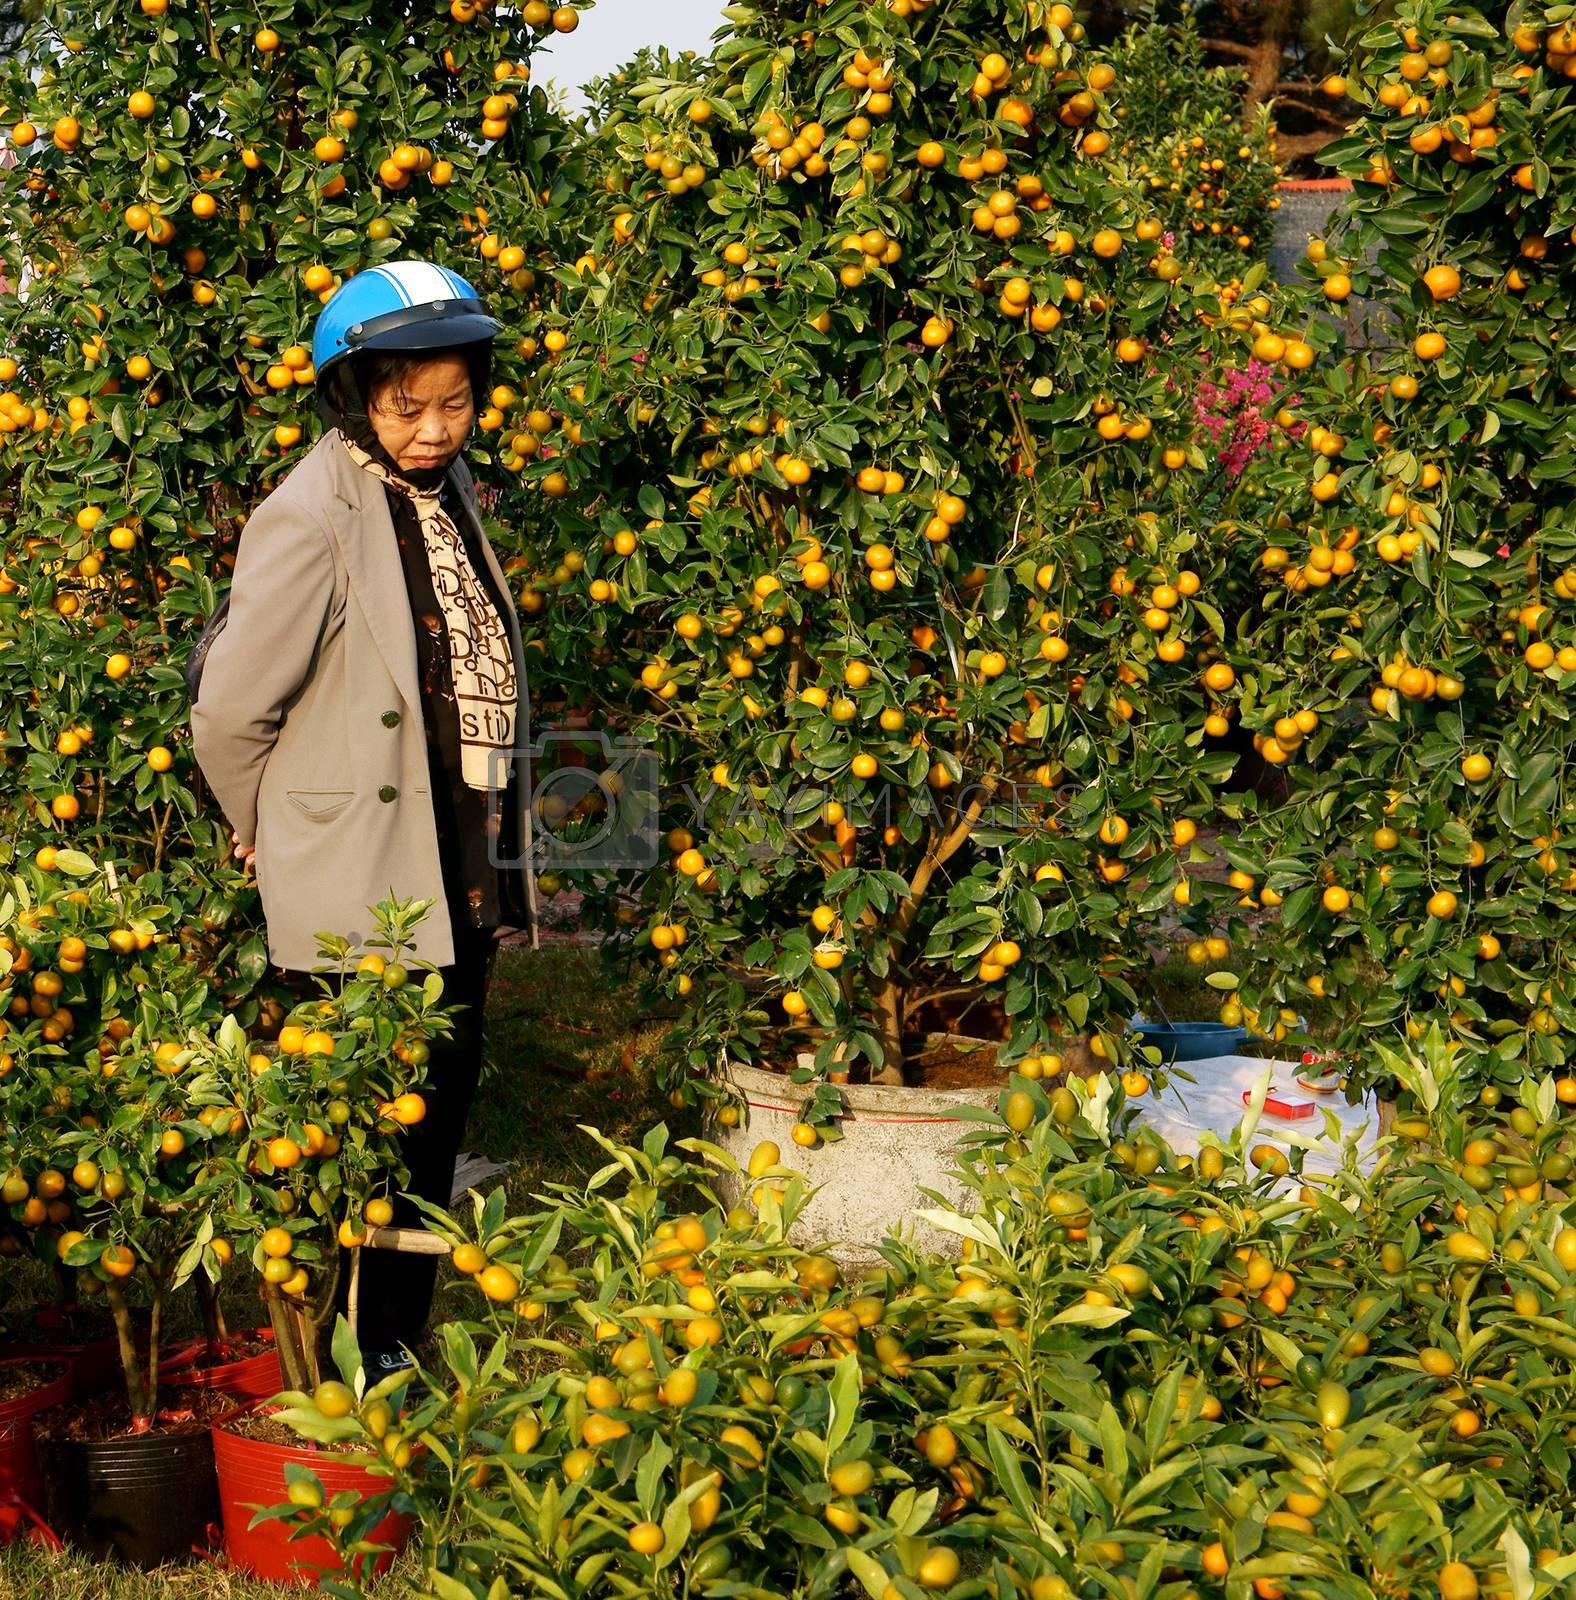 Vietnamese consumer choice at market by xuanhuongho